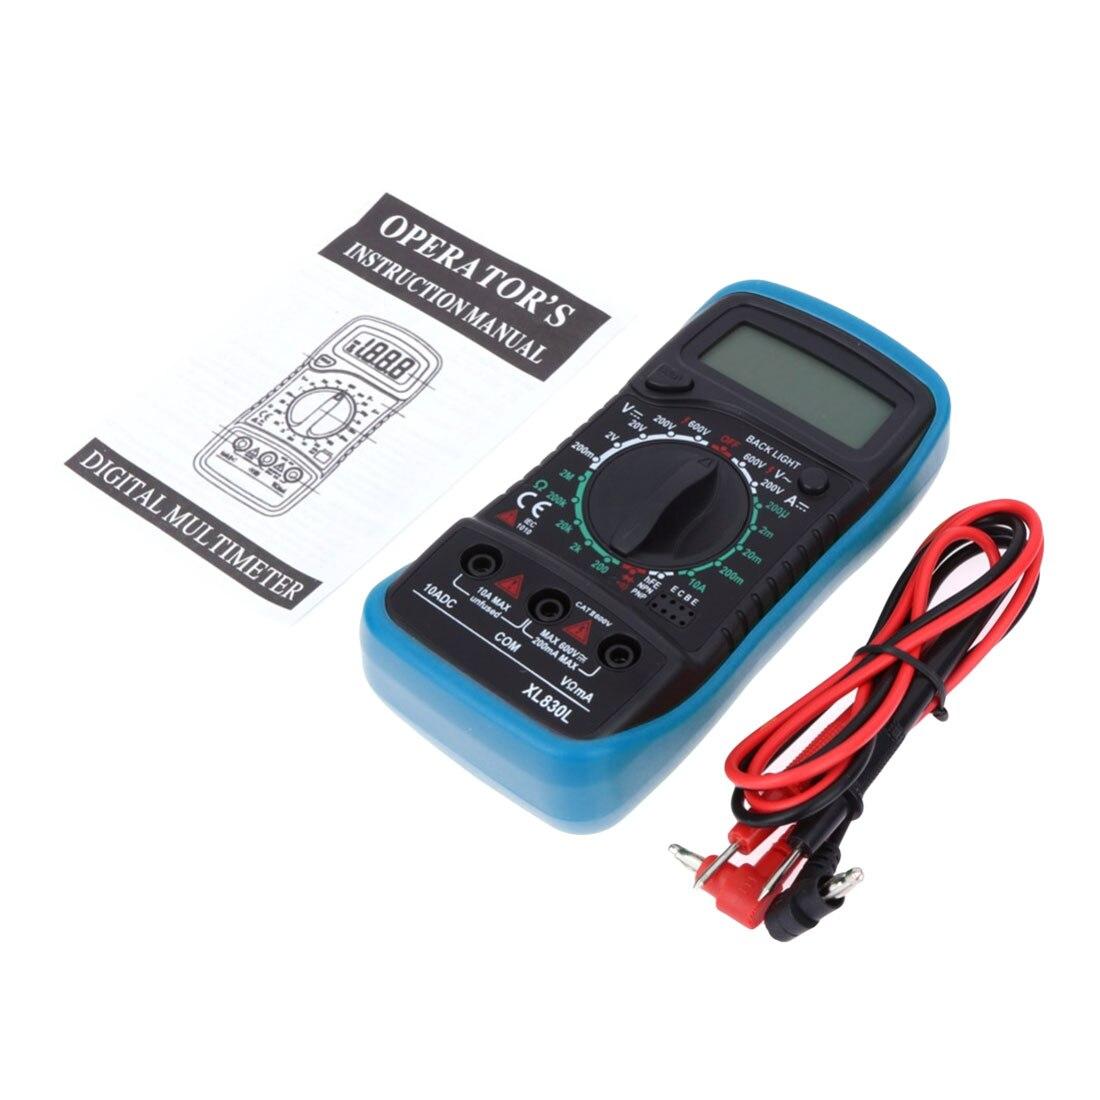 Multímetro Digital LCD Transistor de resistencia al voltaje de corriente hFE Multimetro Multitester Medidor Dijital Multimetro